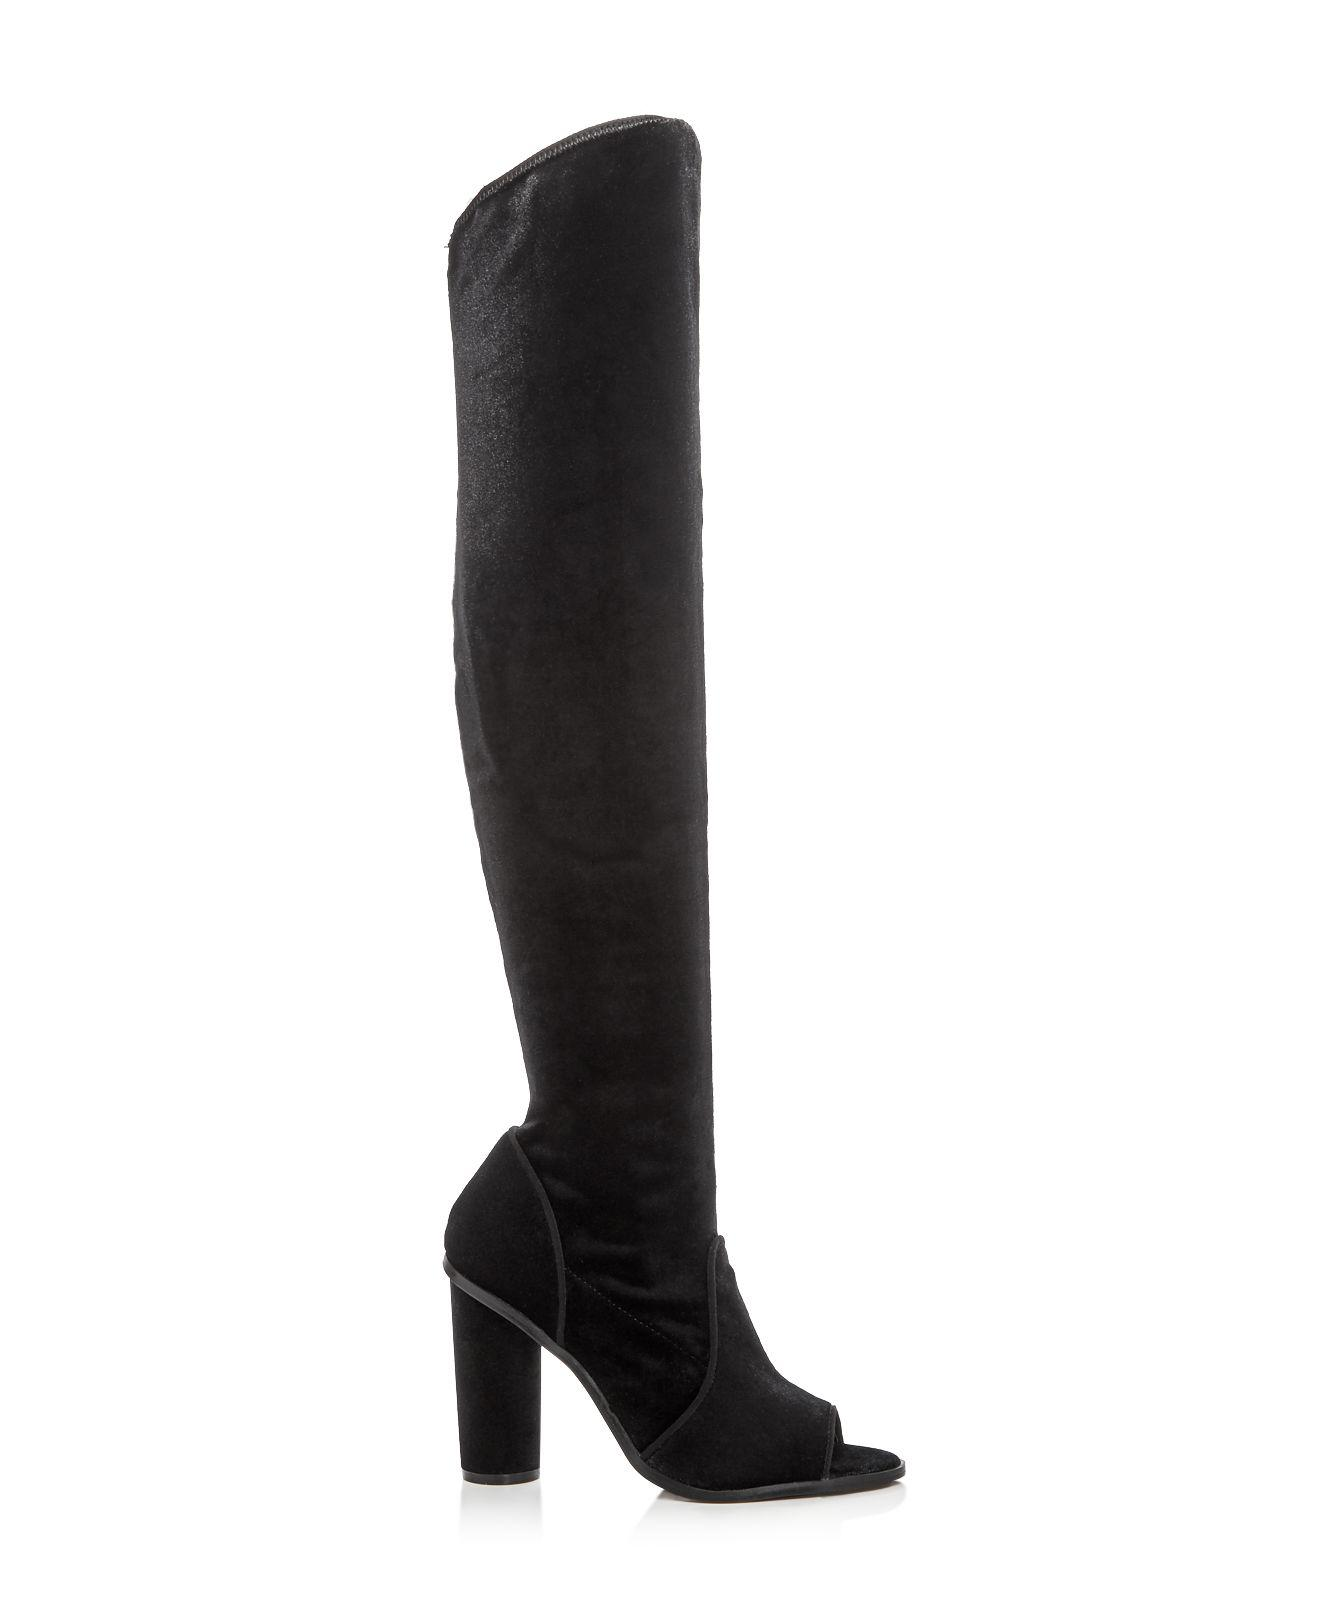 JAGGAR Women's Velvet Peep Toe Over-the-Knee Boots 0wuzhHI3Qb